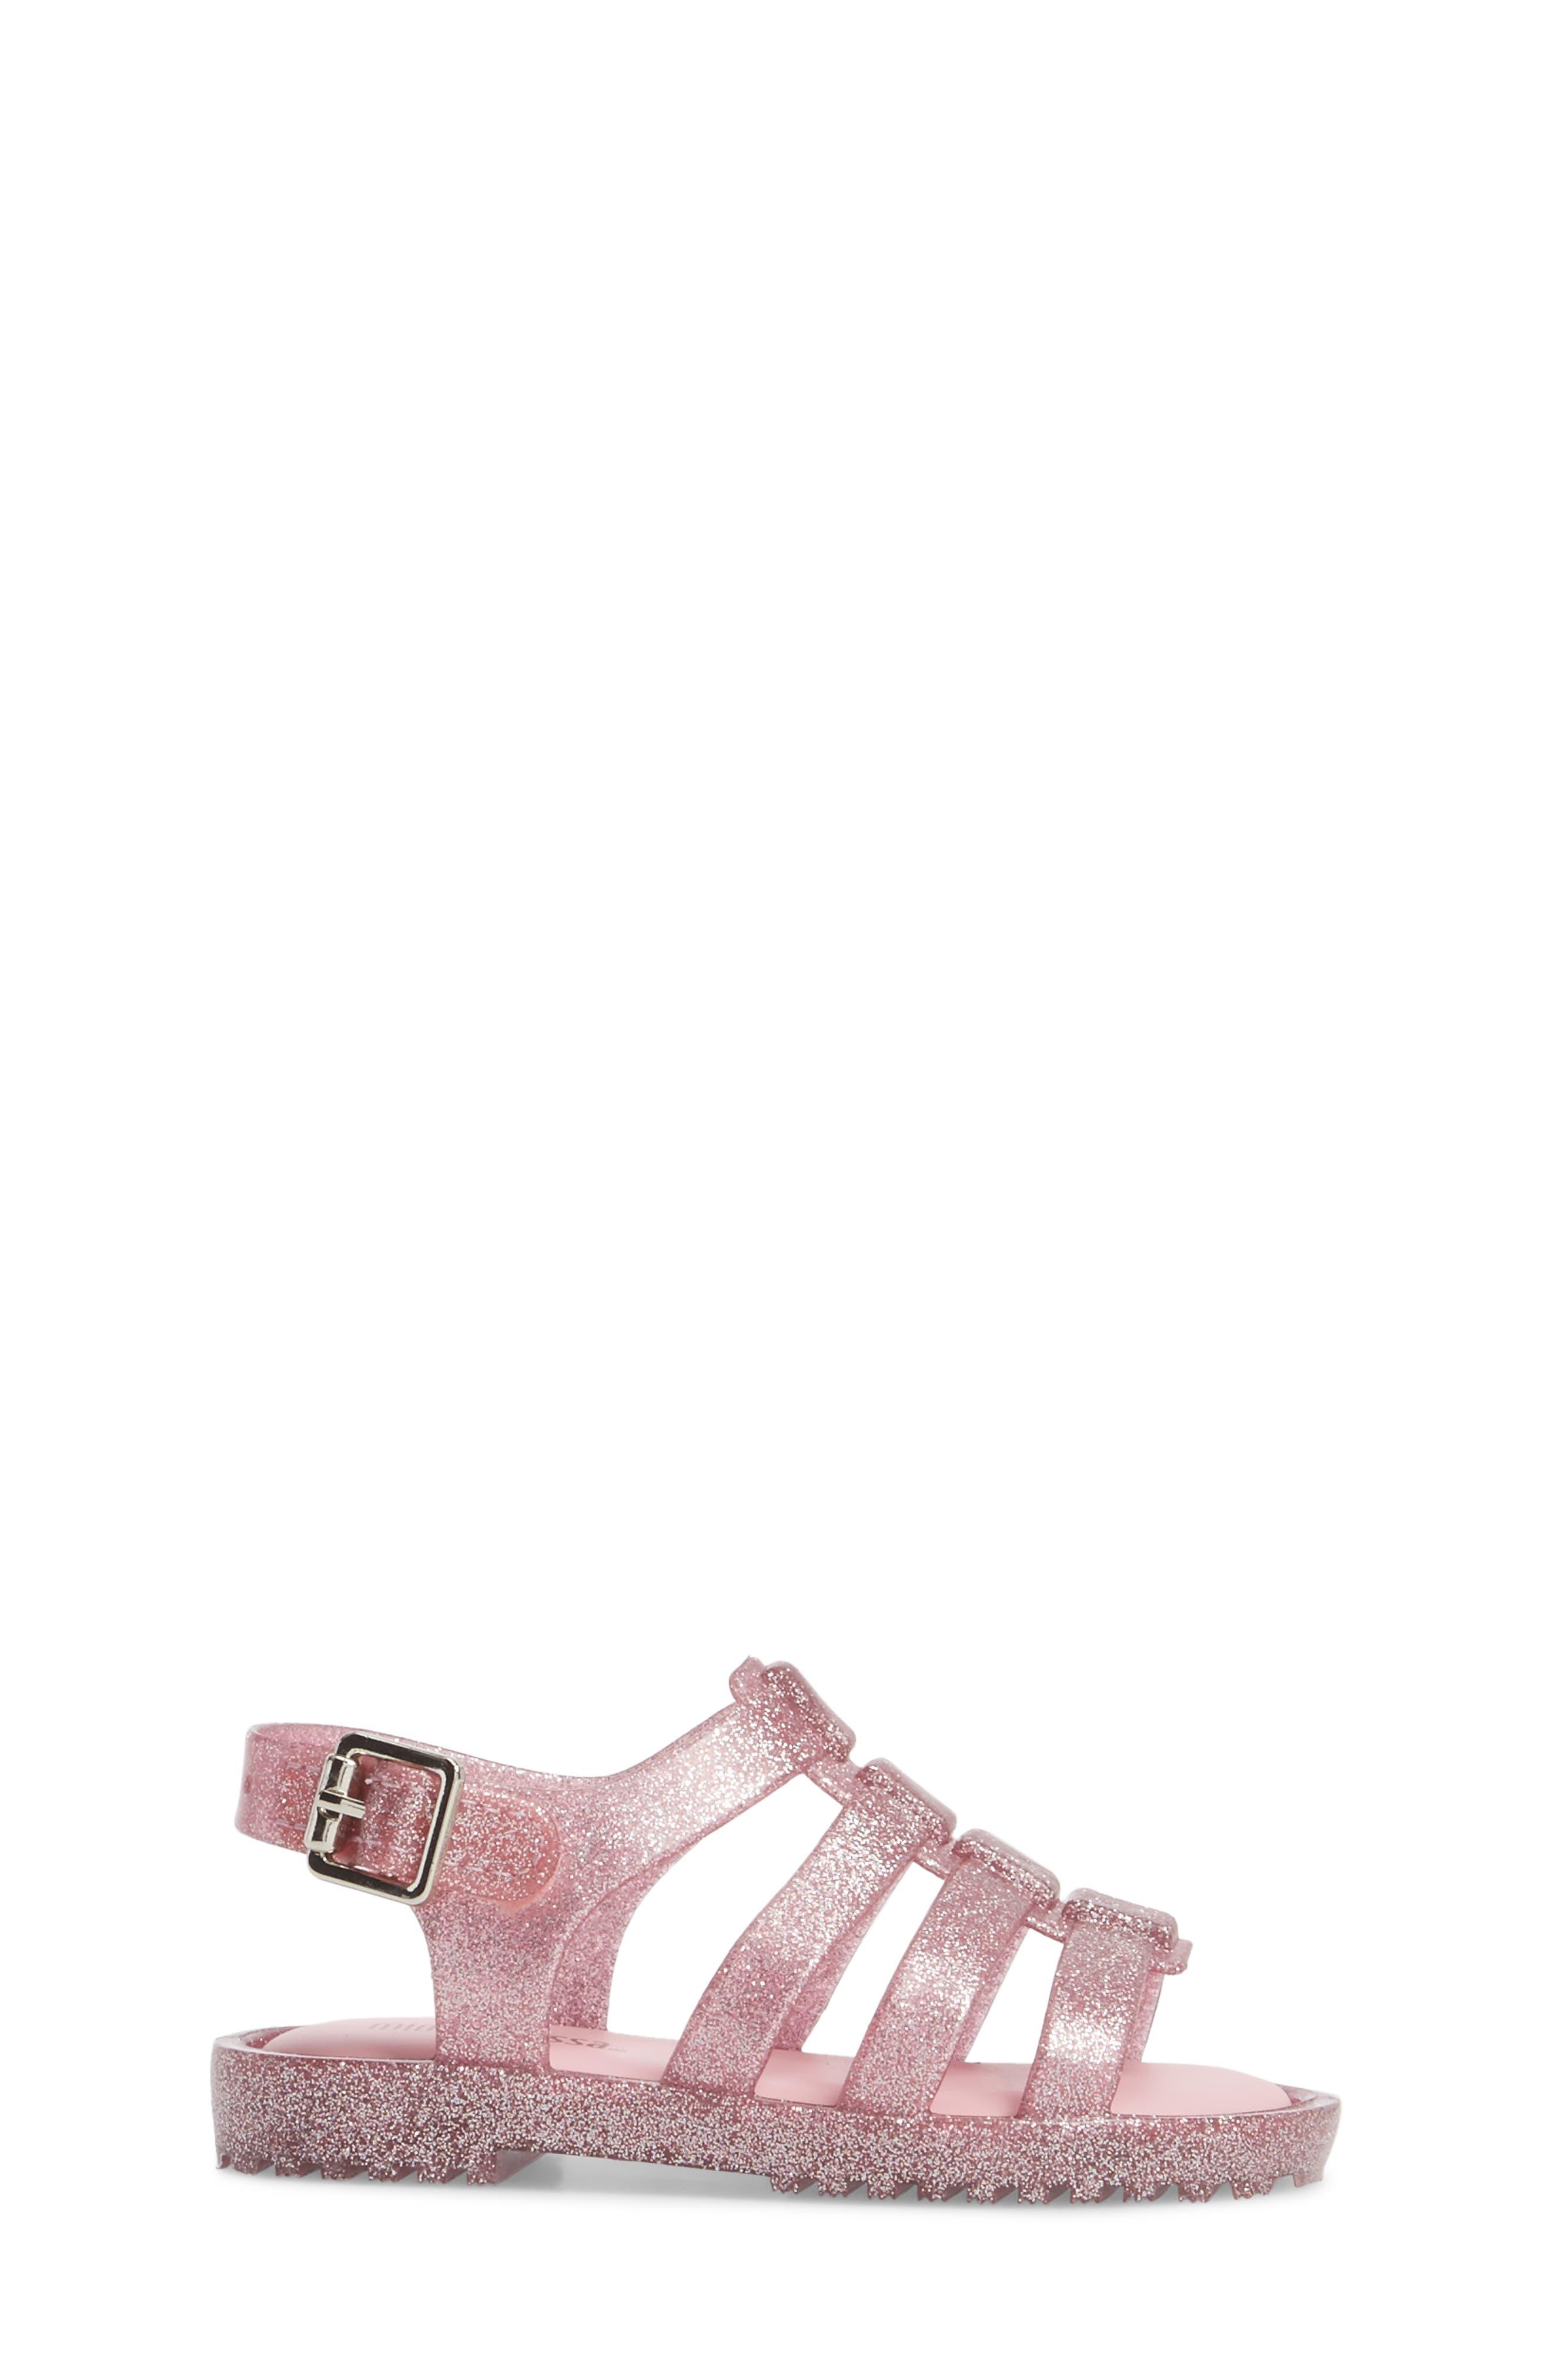 'Flox' Sandal,                             Alternate thumbnail 3, color,                             657